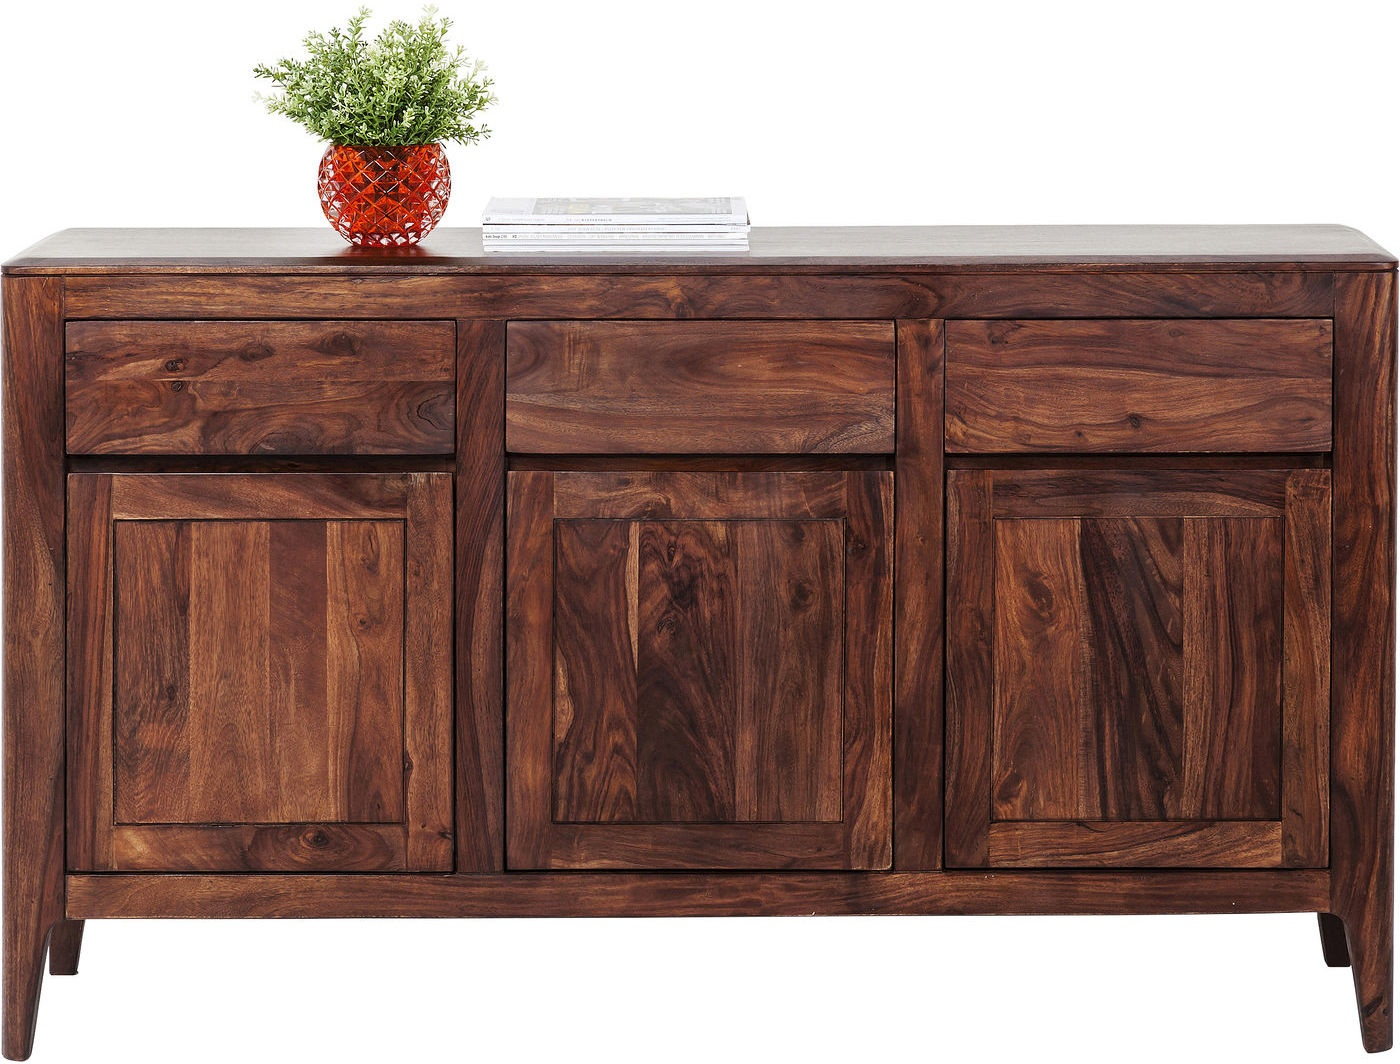 Zuiver dressoir high on wood l120 x b40 x h71 5 cm 2dr 1do for Dressoir design